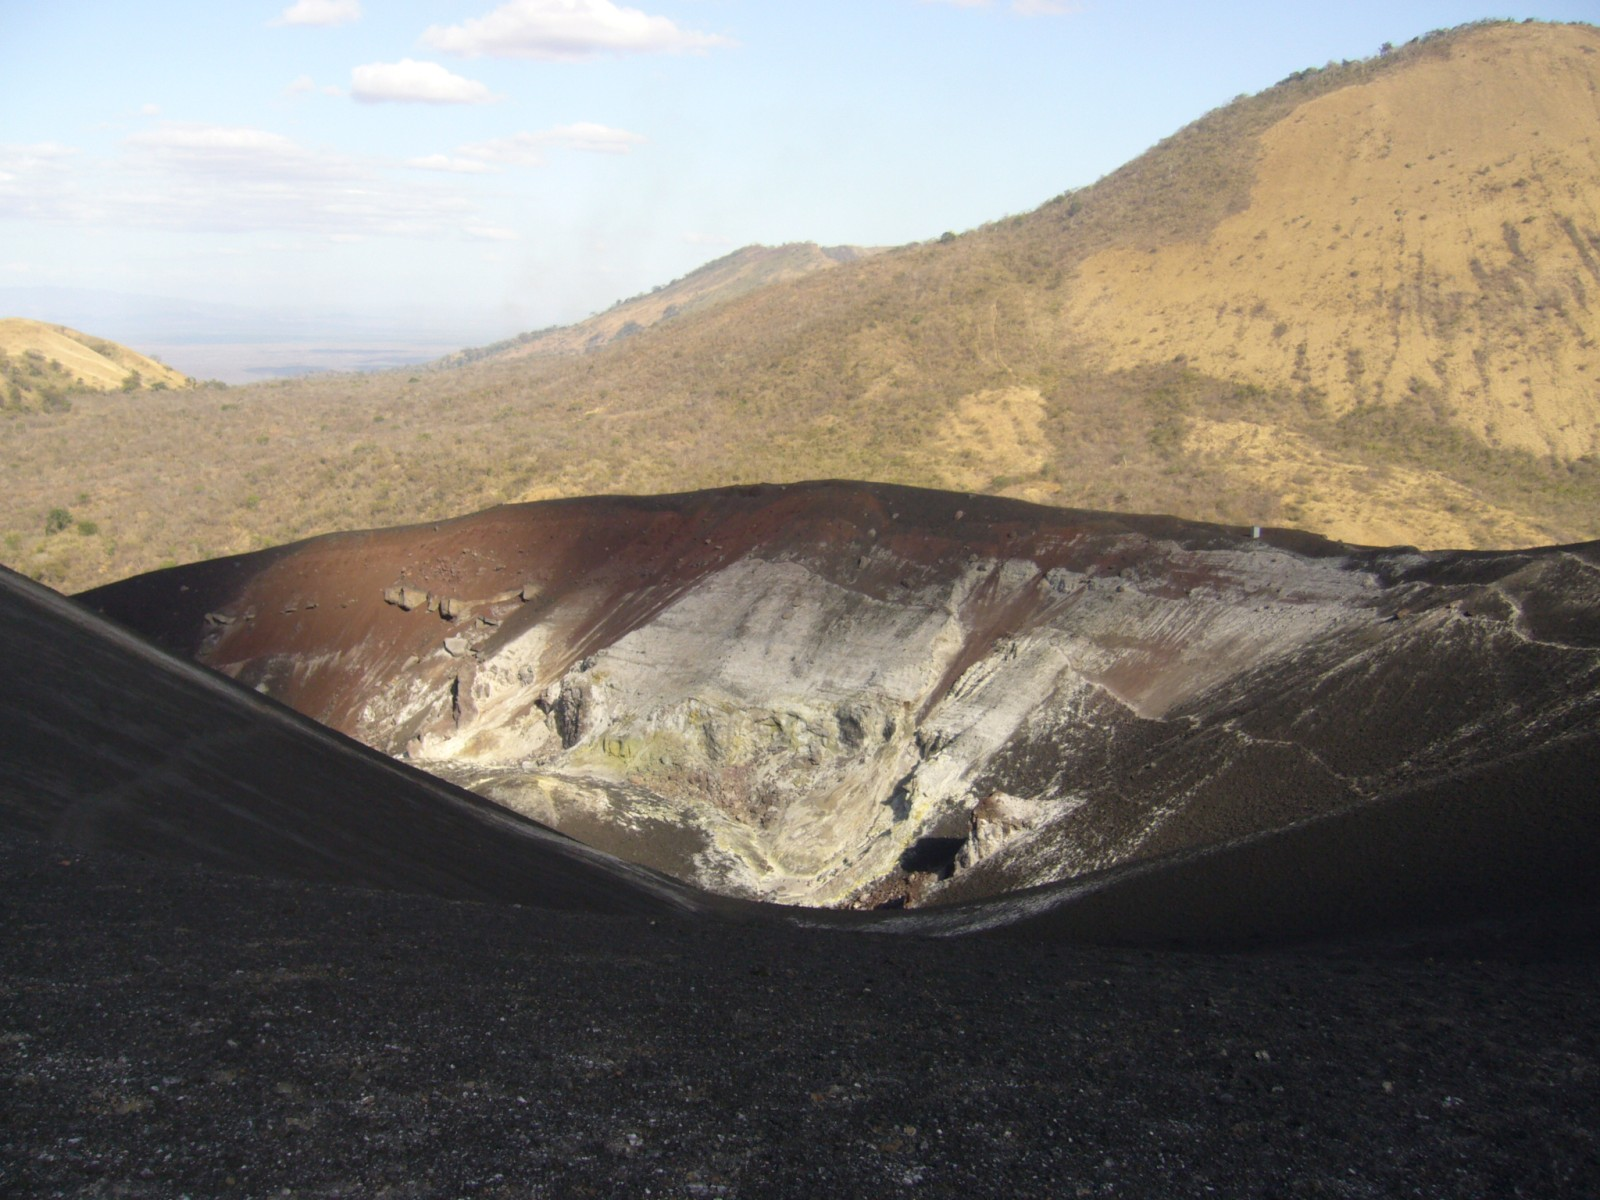 nic08-climb-an-active-volcano-free-rafe